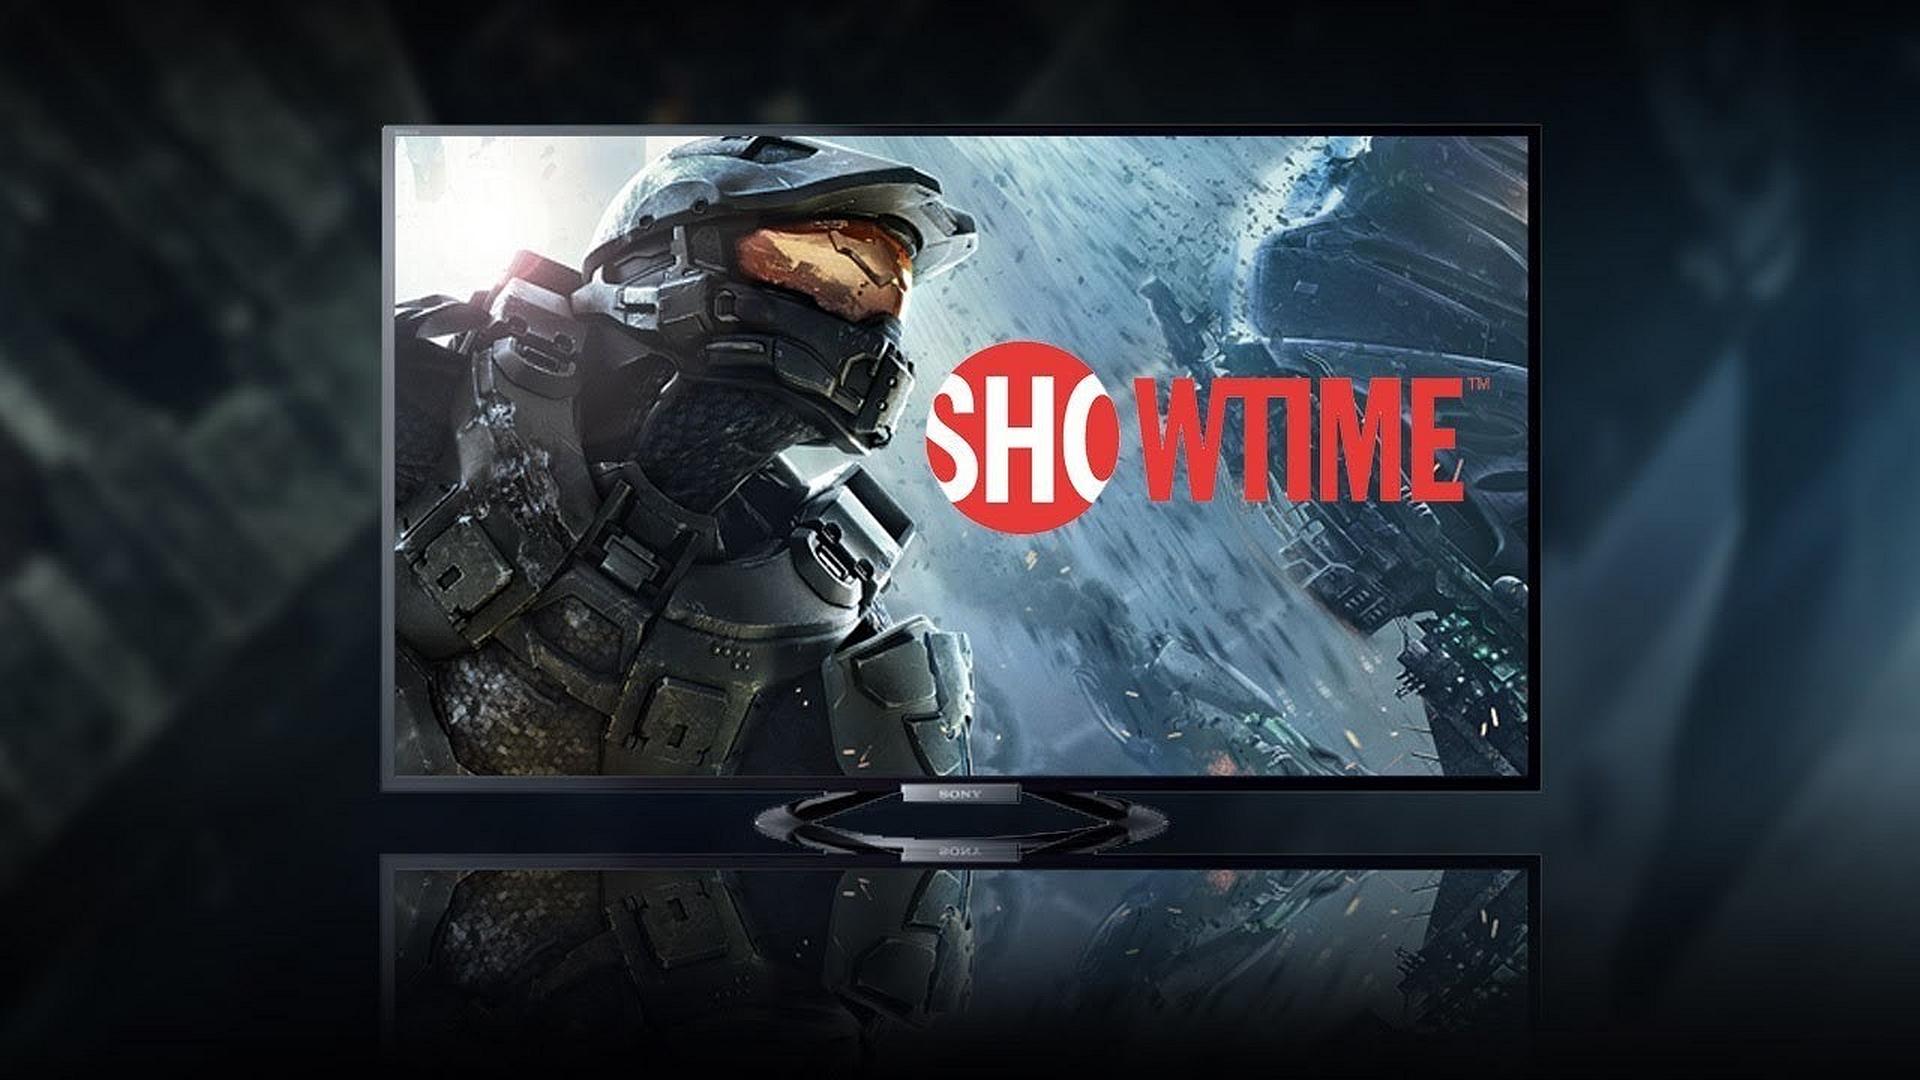 Halo TV Series Cast Revealed